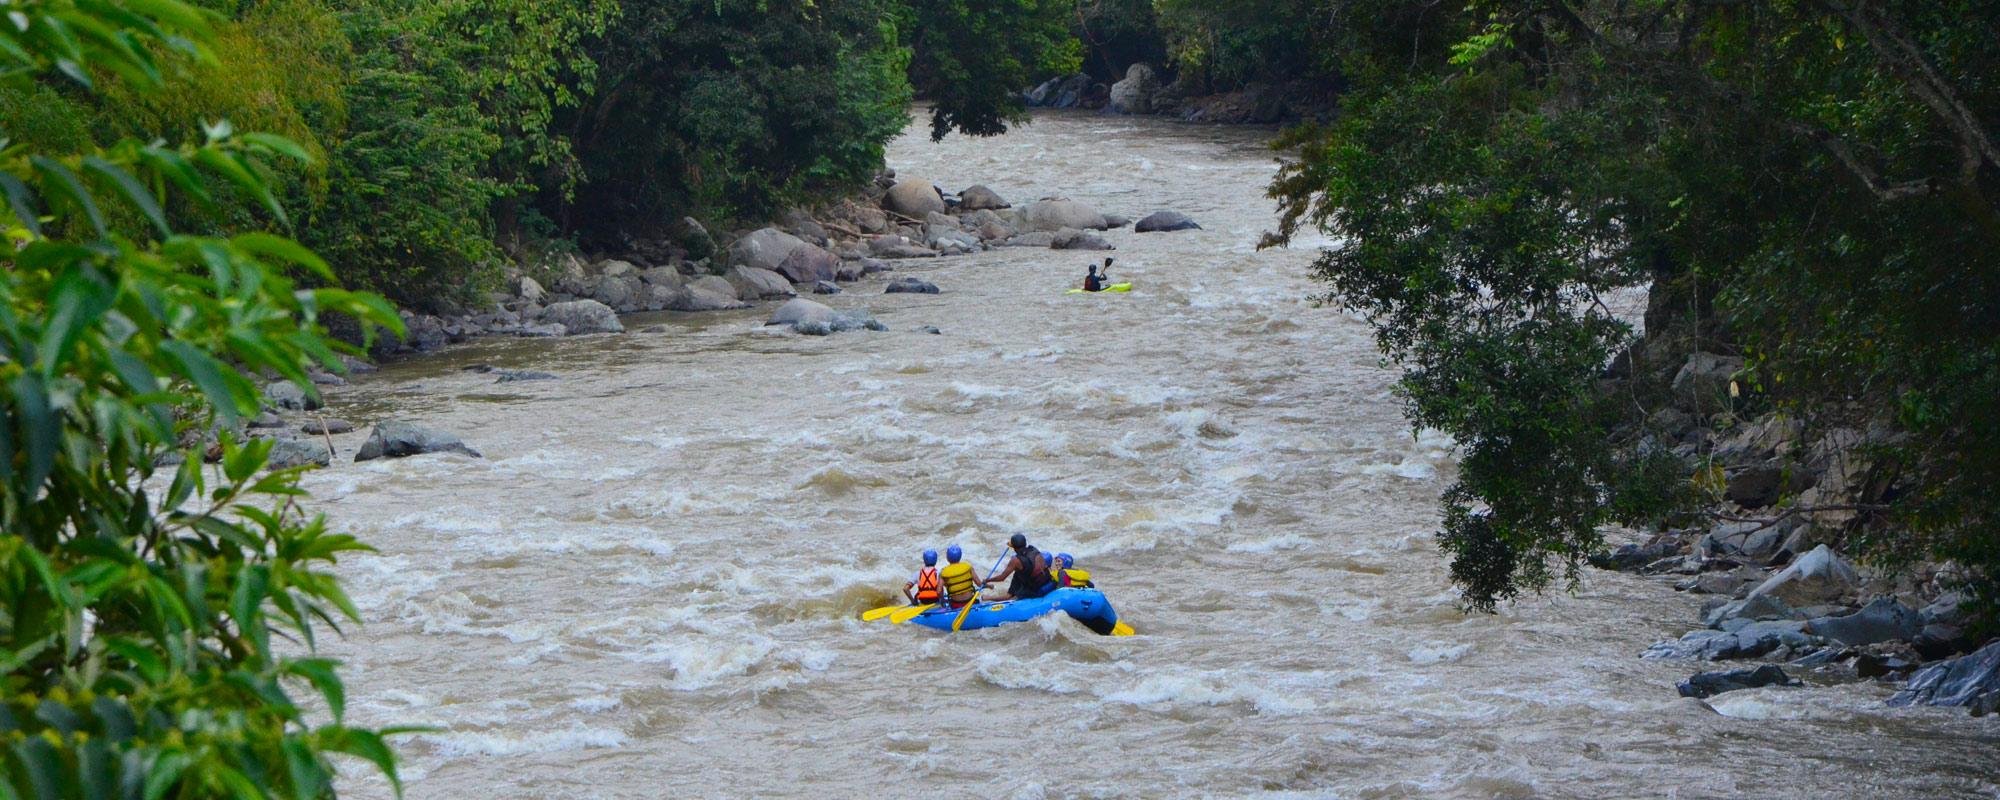 medellin-rafting-02 Medellin Rafting